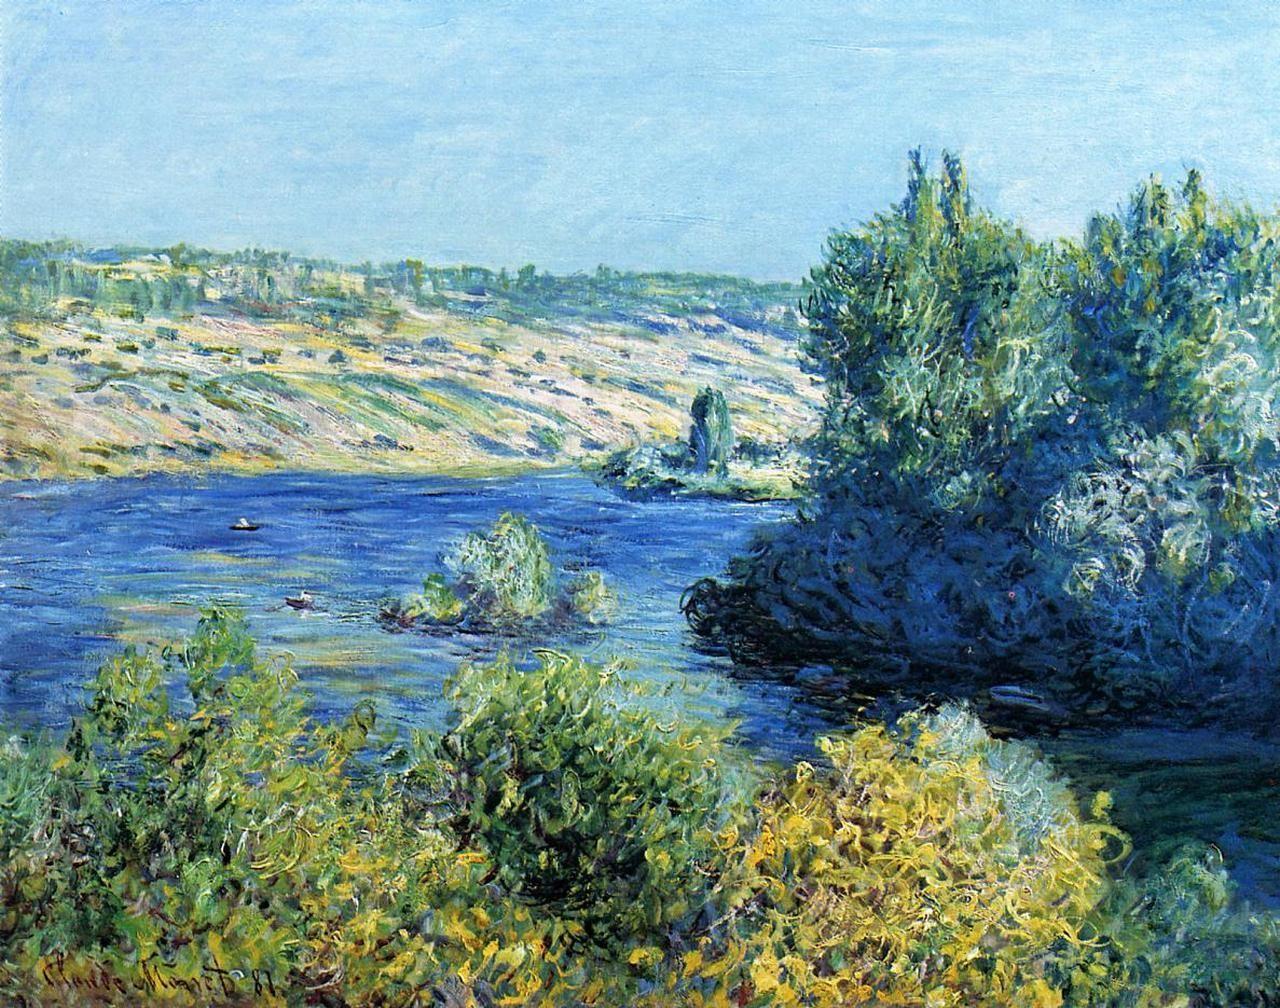 Pin by Nando Genise on Monet | Claude monet art, Monet art, Monet oil  paintings